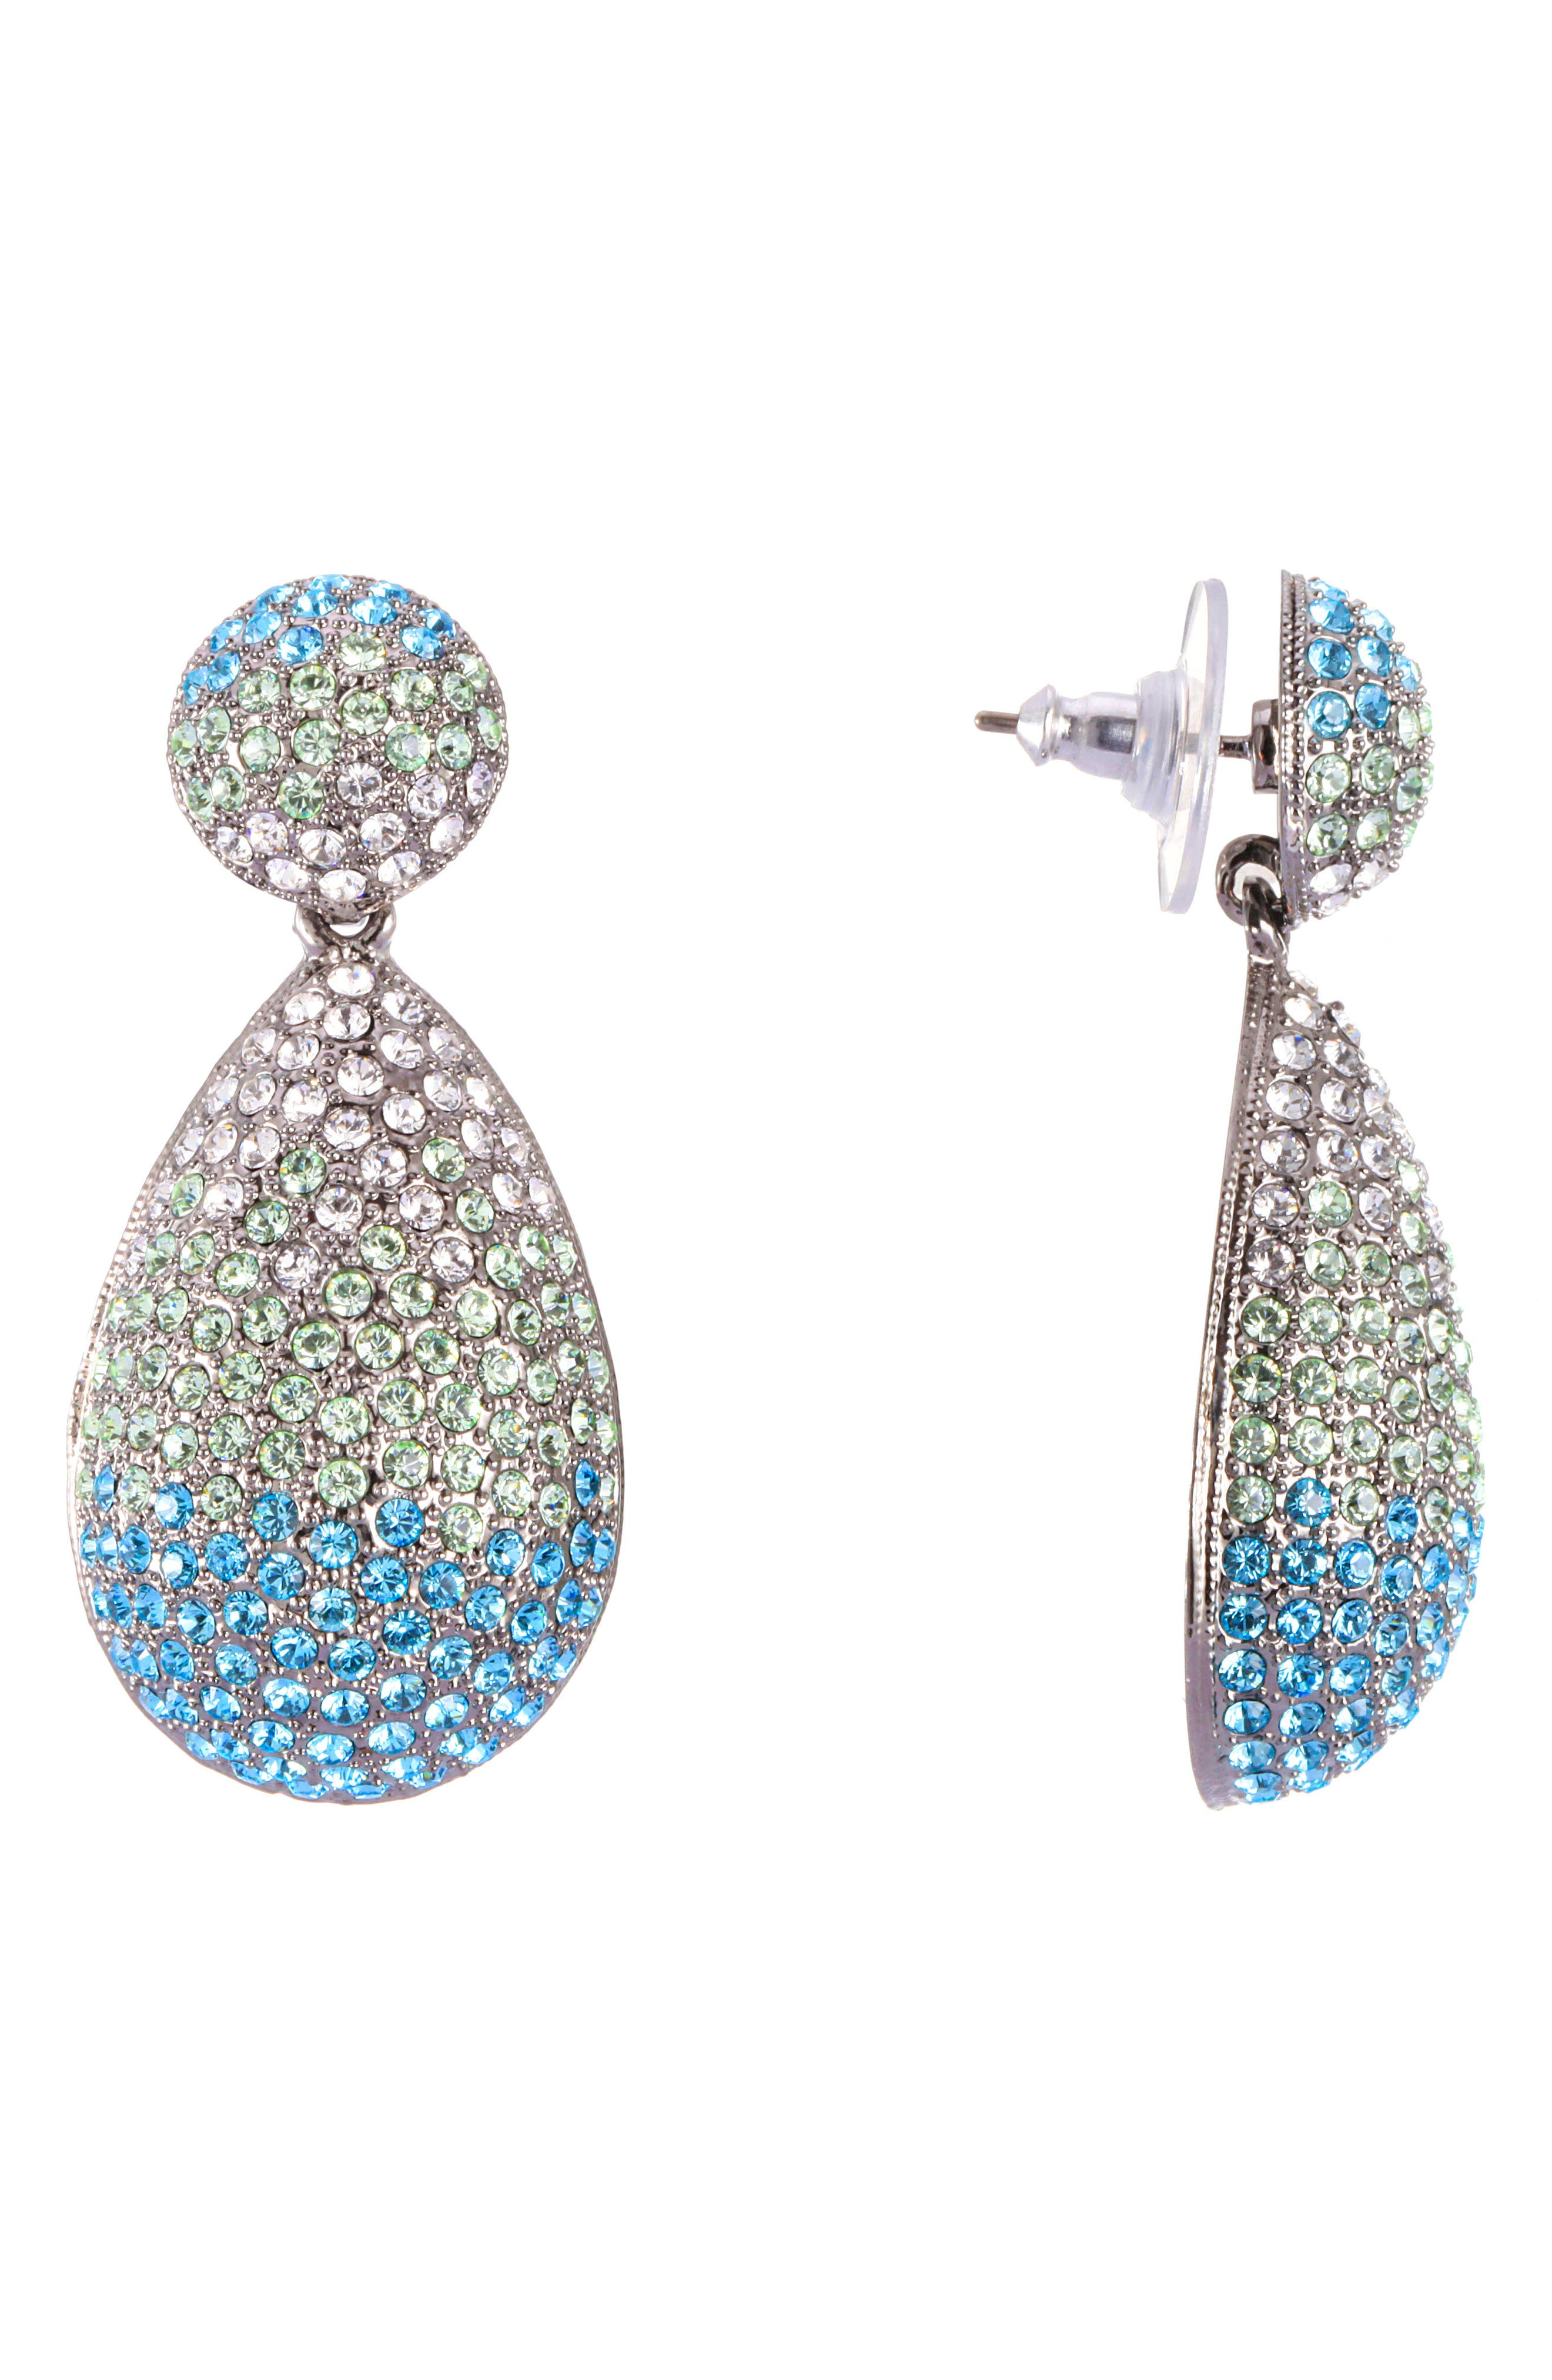 NINA Large Pavé Swarovski Crystal Teardrop Drop Earrings, Main, color, AQUA/ SILVER